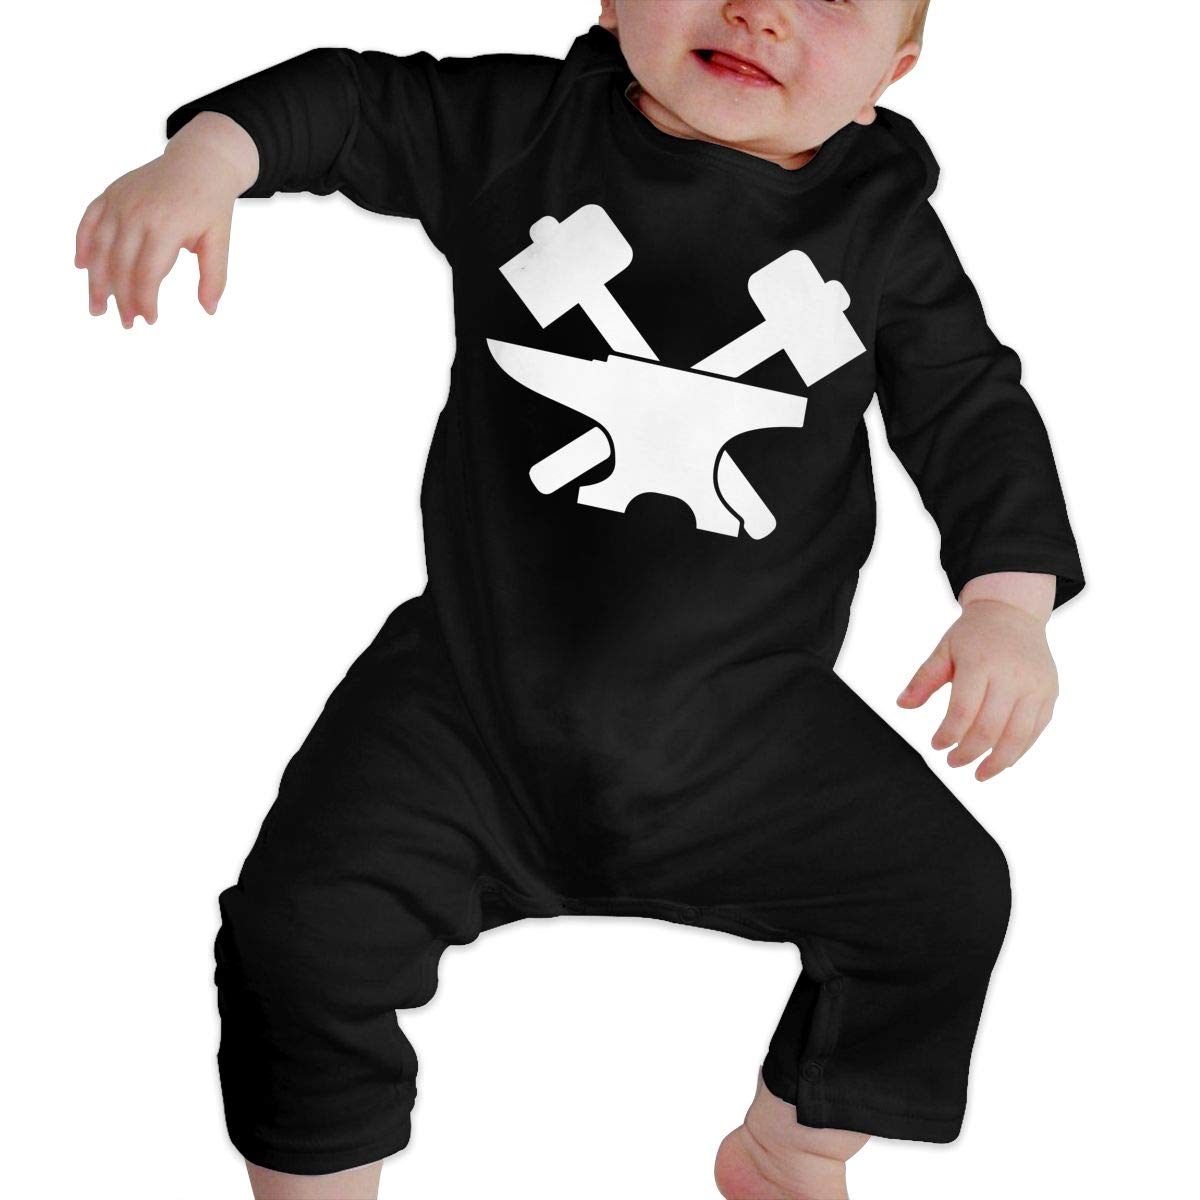 UGFGF-S3 Blacksmith Newborn Baby Long Sleeve Romper Jumpsuit Bodysuits